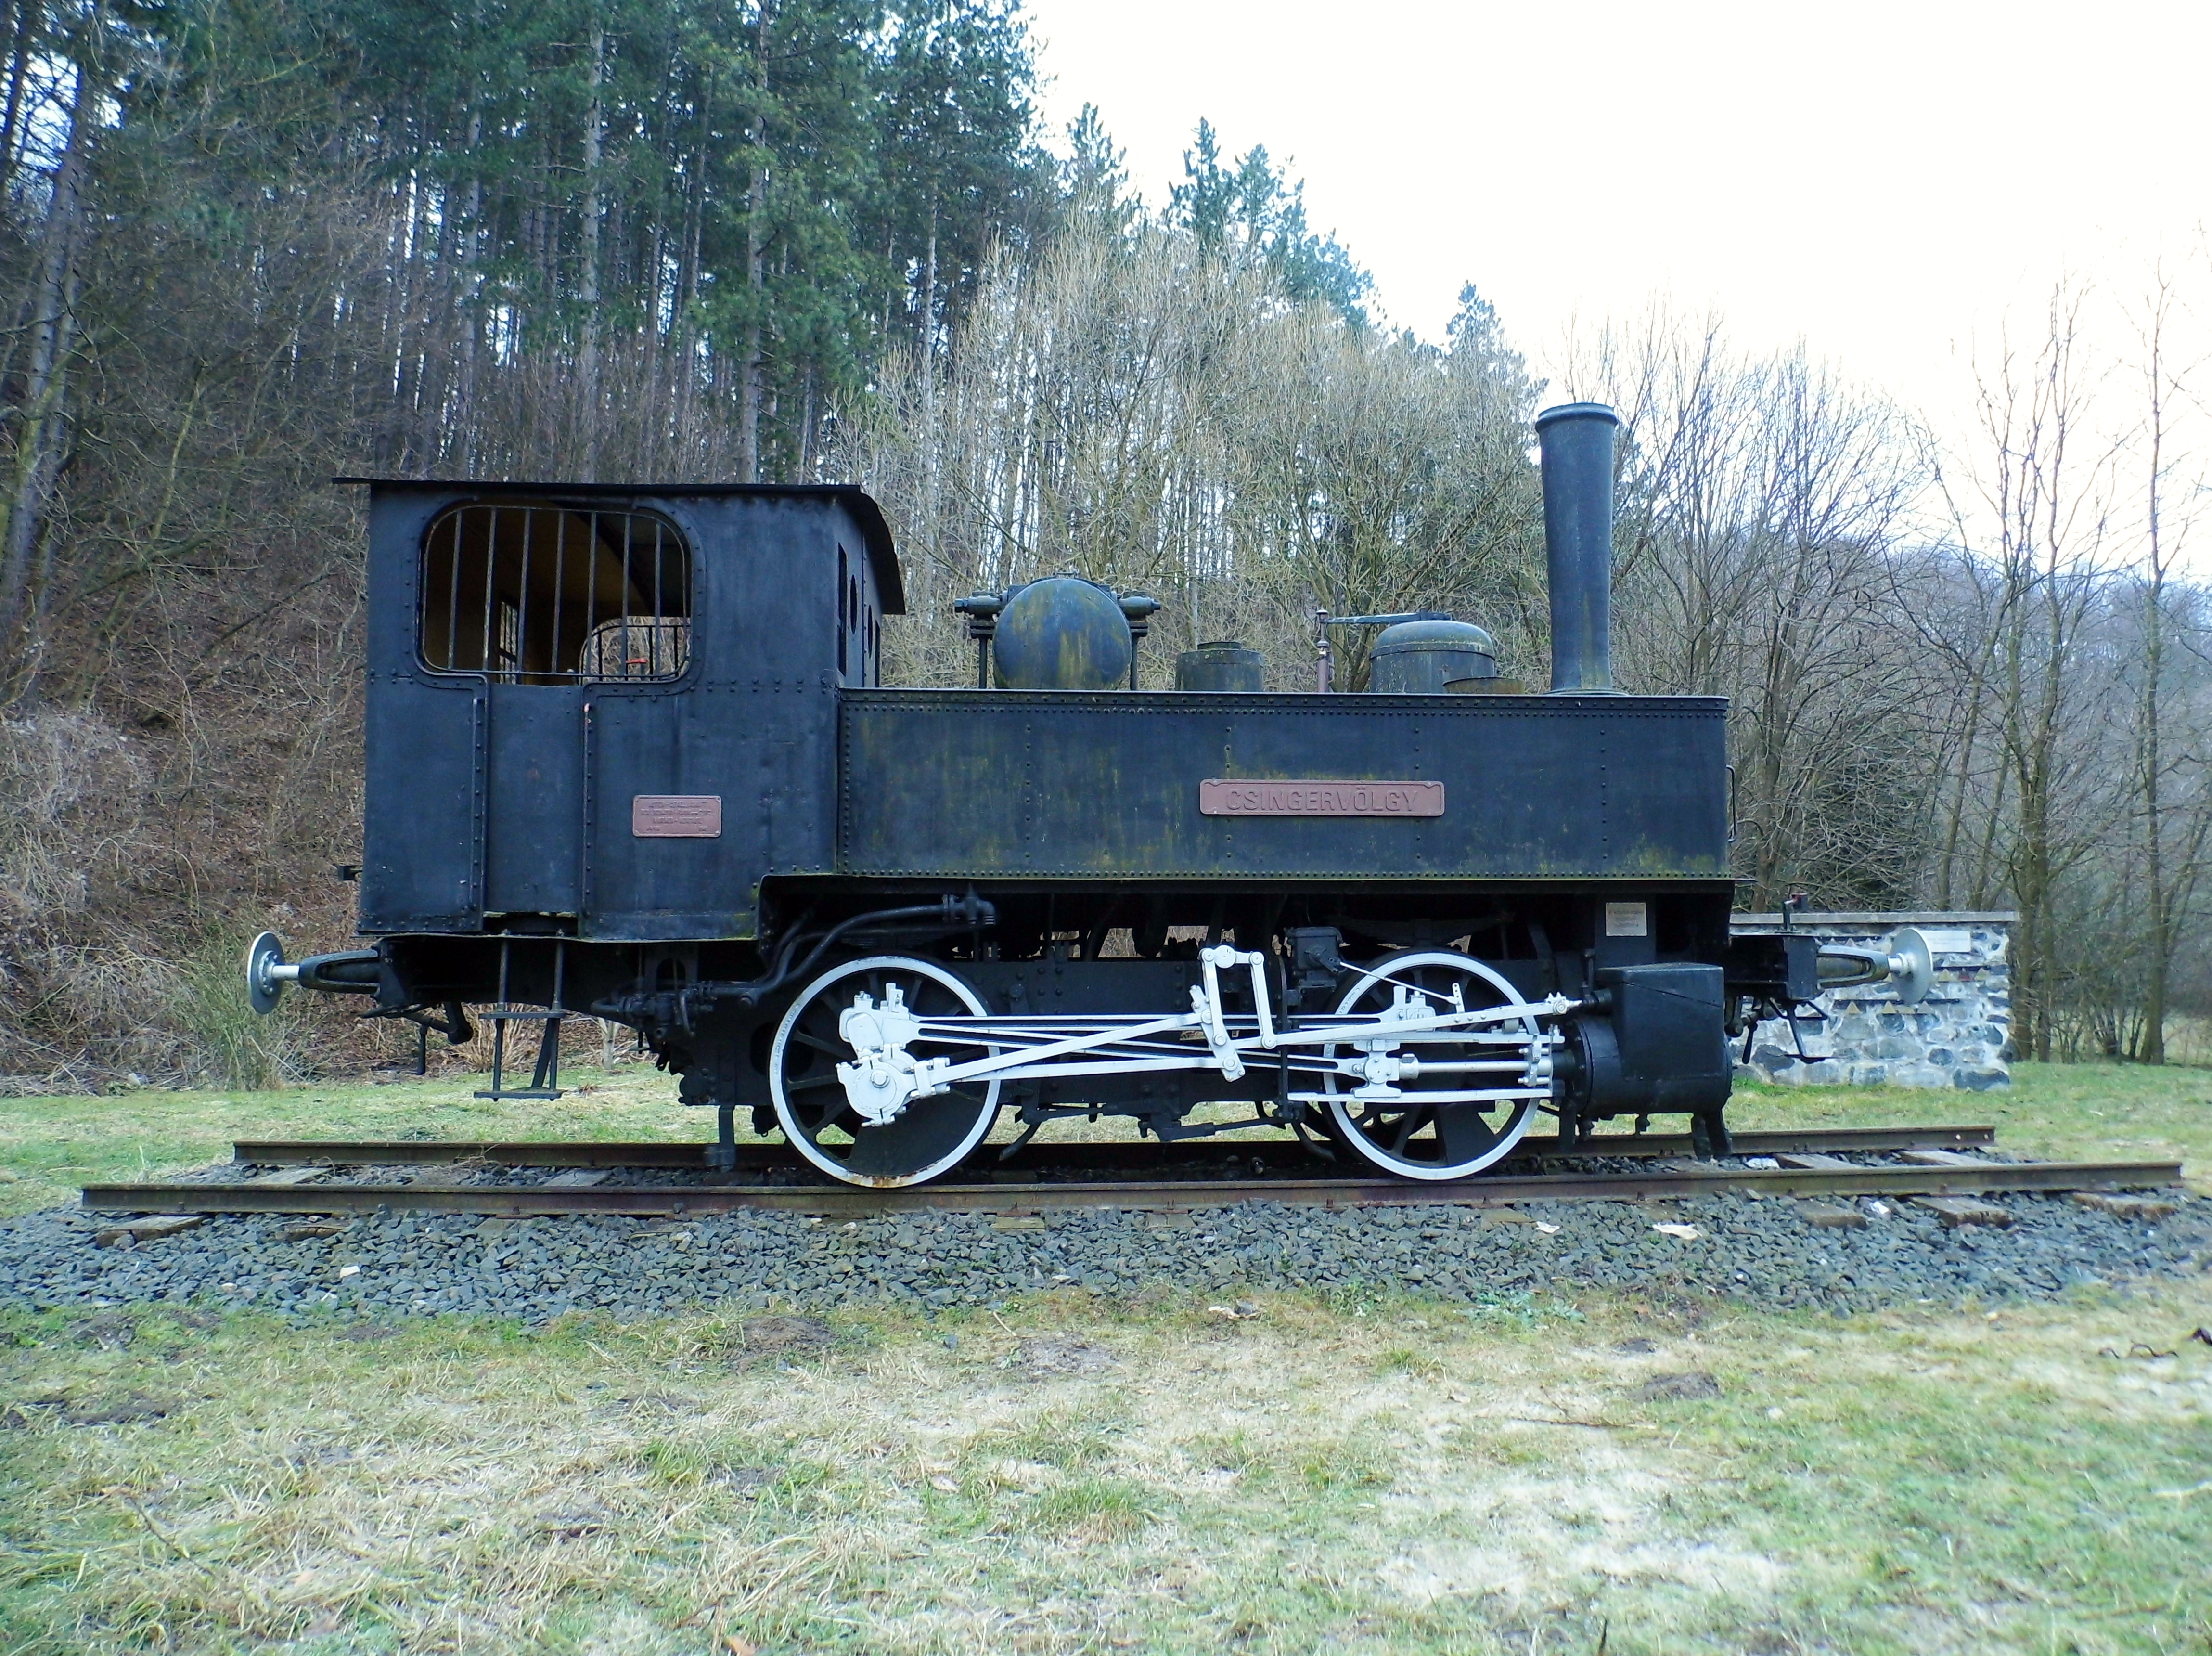 Steam locomotive Csingervölgy in Csingervögy, Ajka.JPG